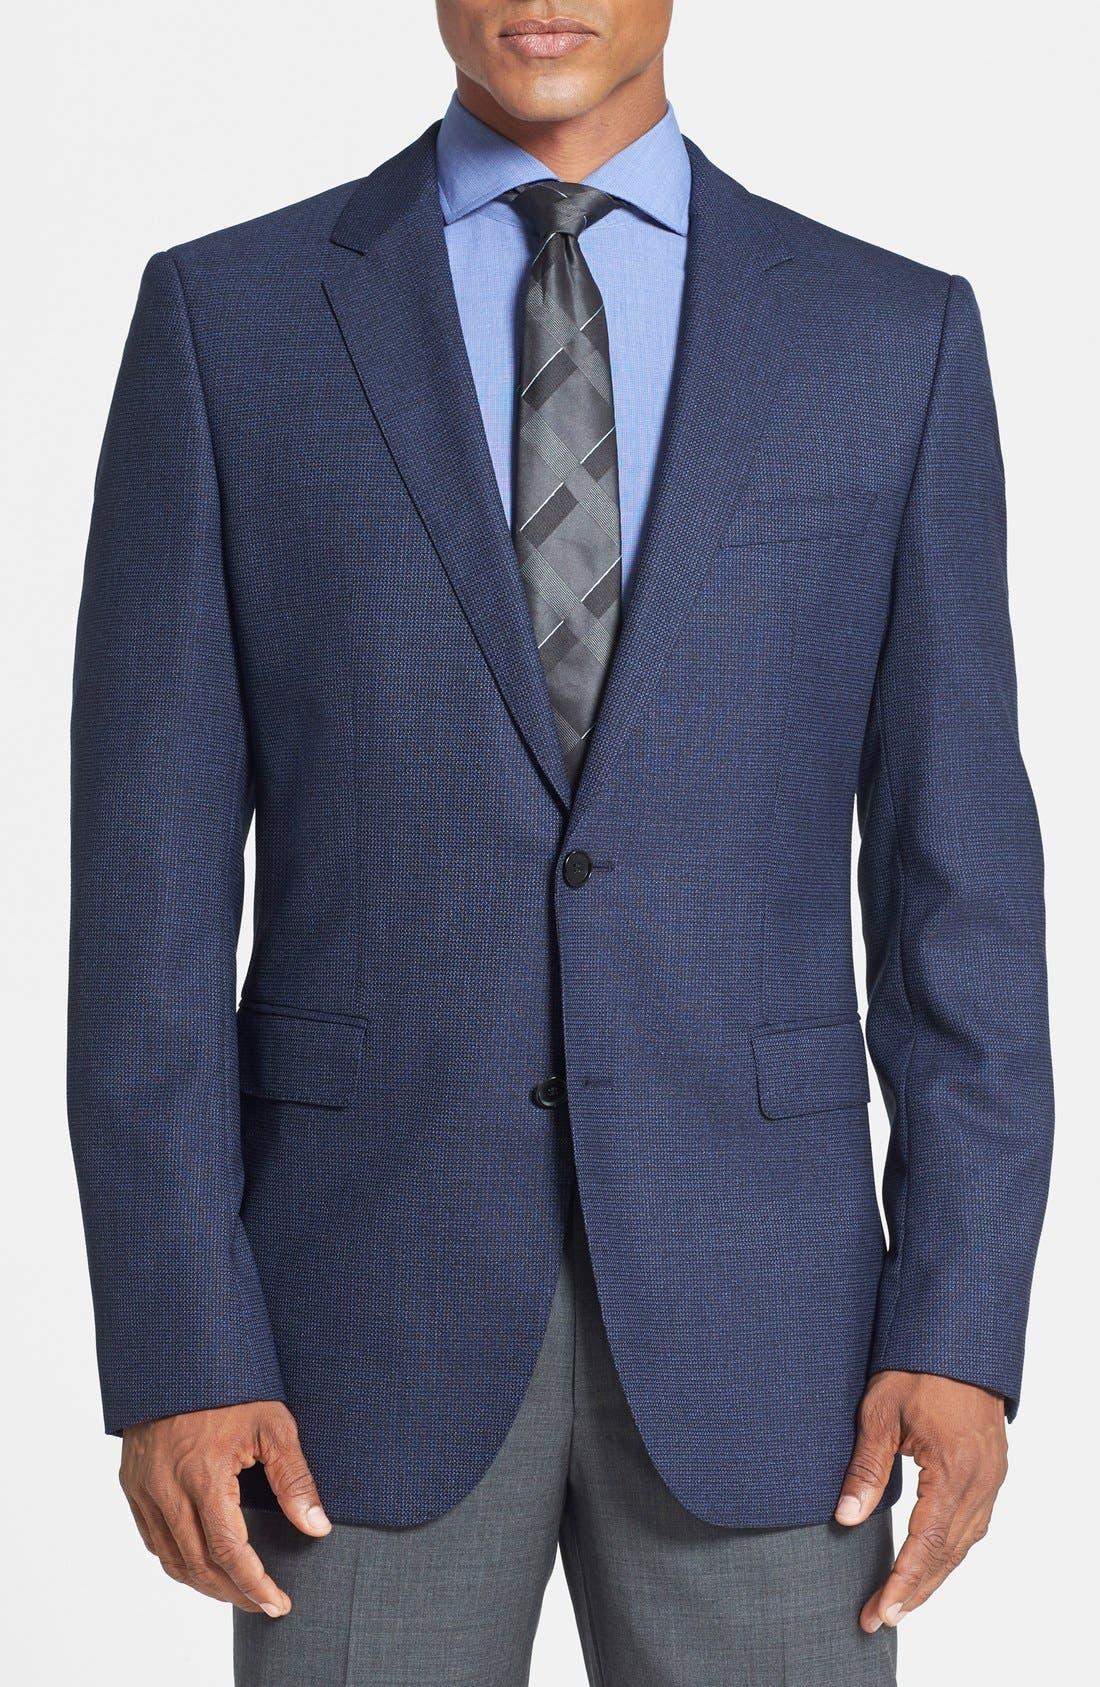 Main Image - BOSS HUGO BOSS 'James' Trim Fit Wool Blazer